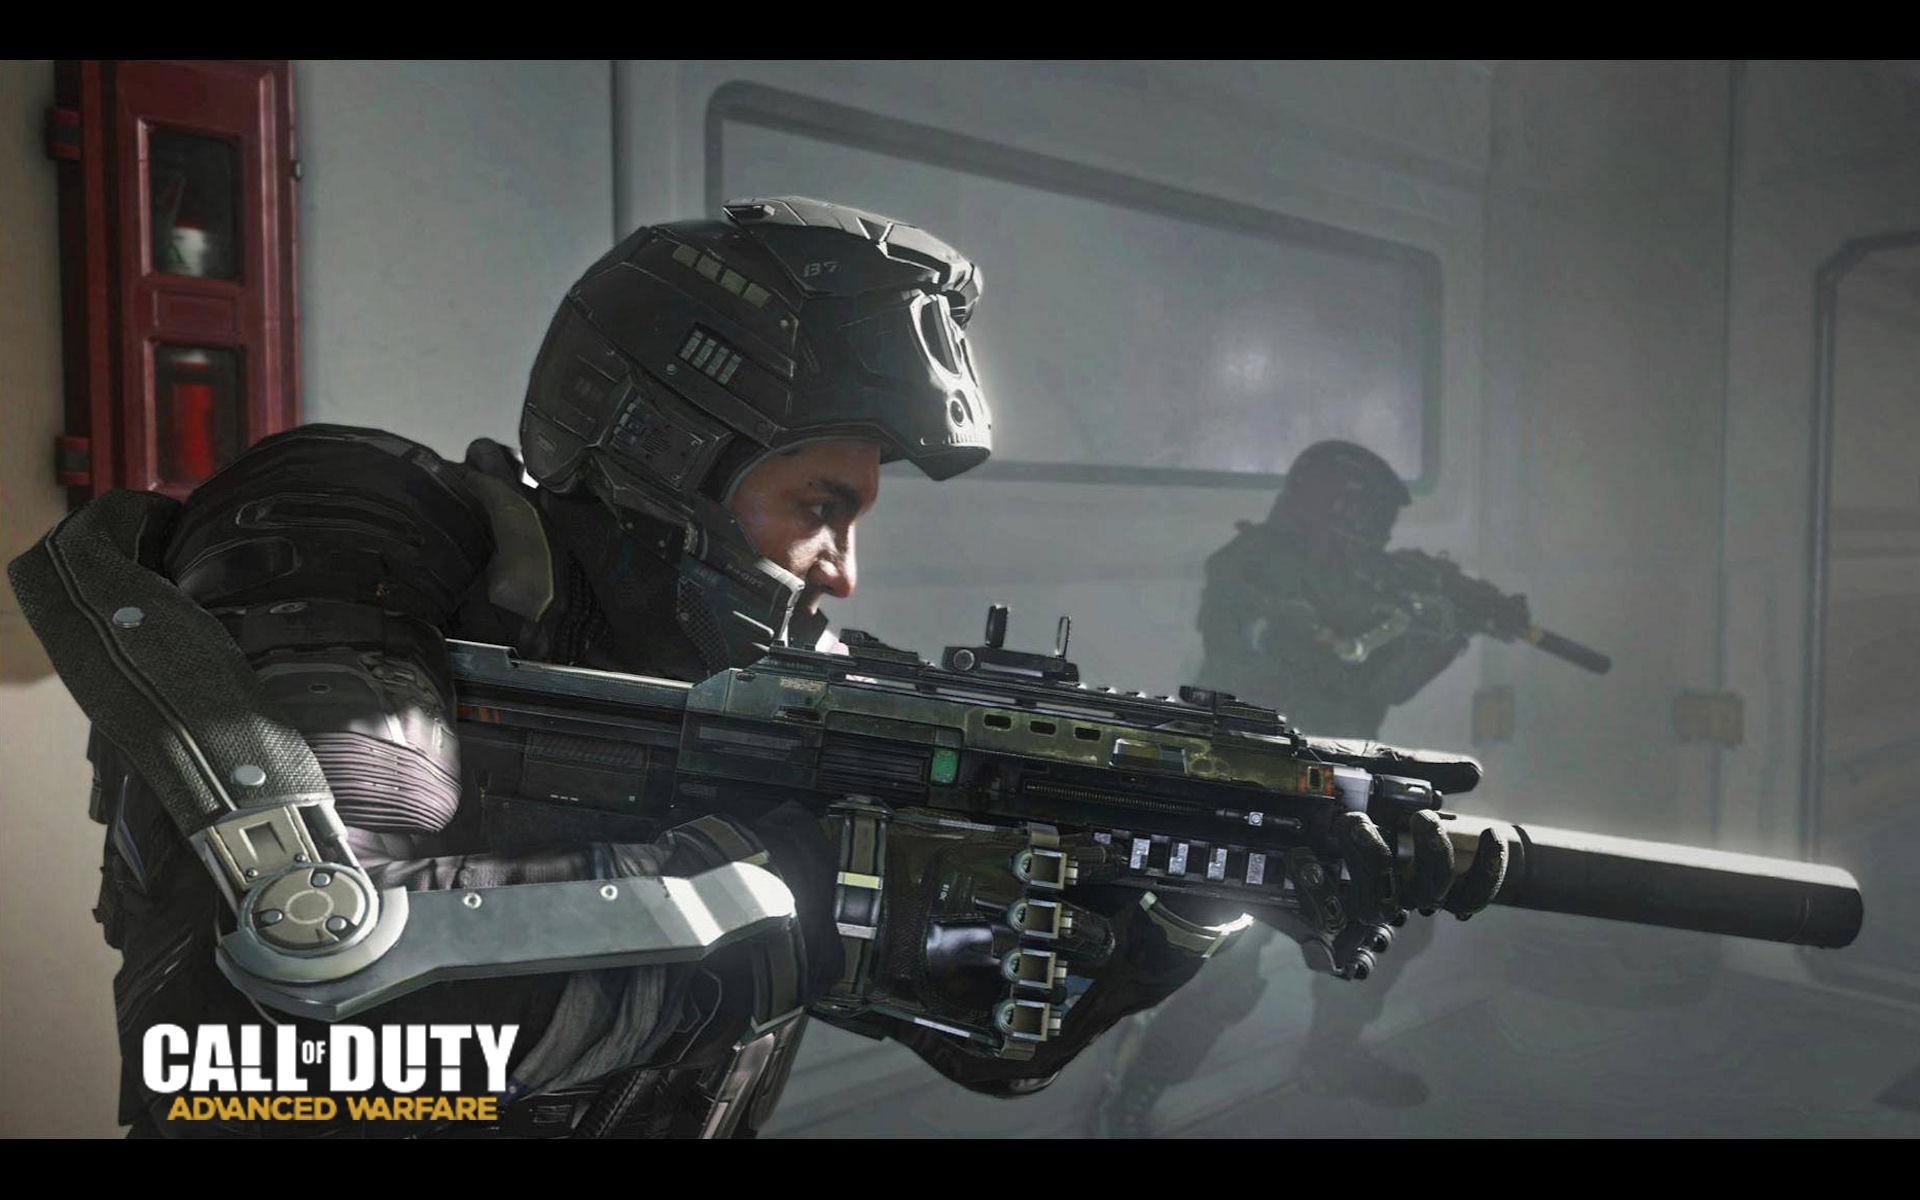 Call Of Duty Advanced Warfare Gun Wallpaper